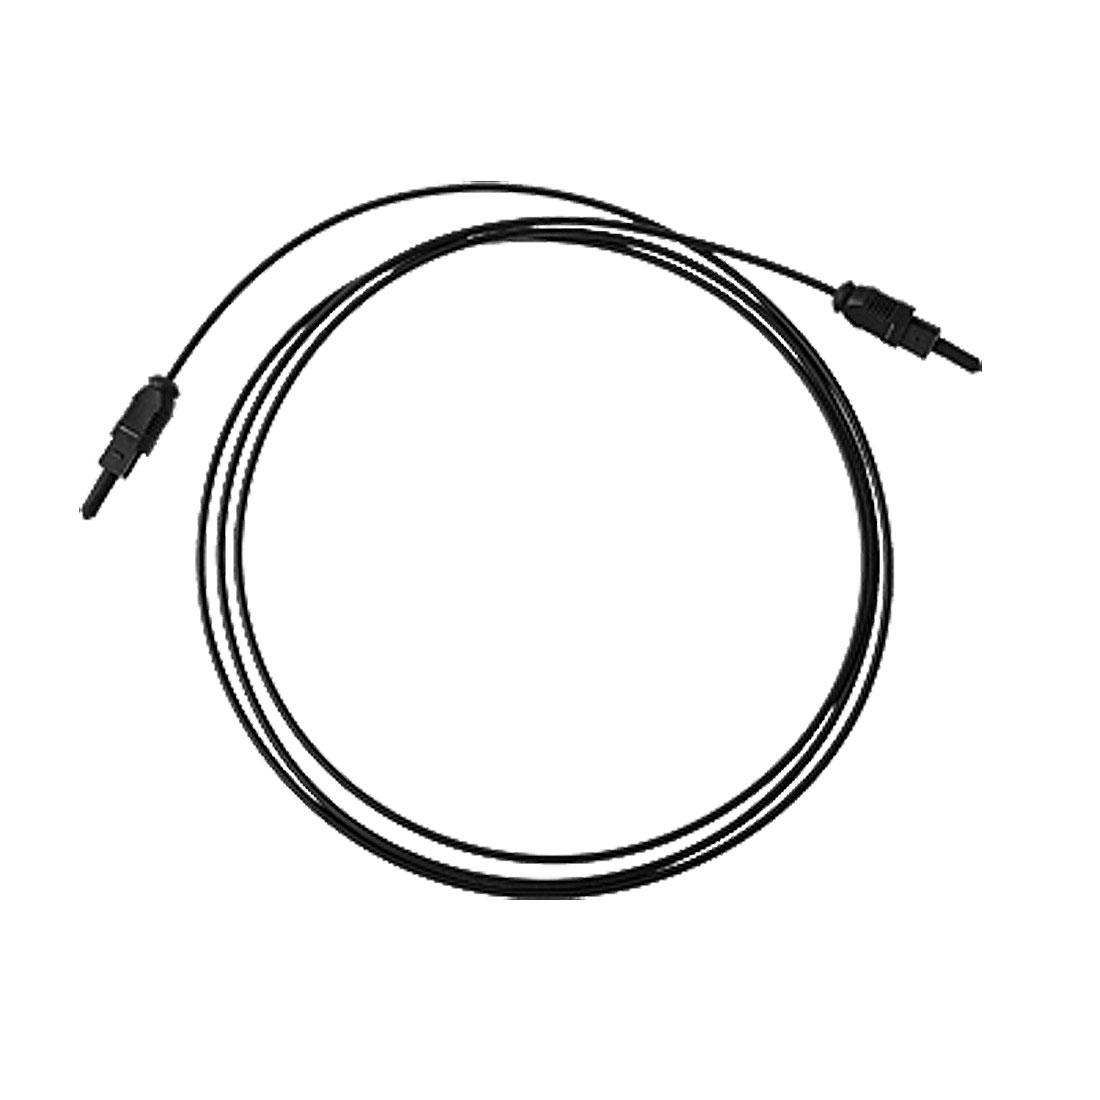 Optical Fiber Digital DVD CD Audio DTS Cable 5FT Black